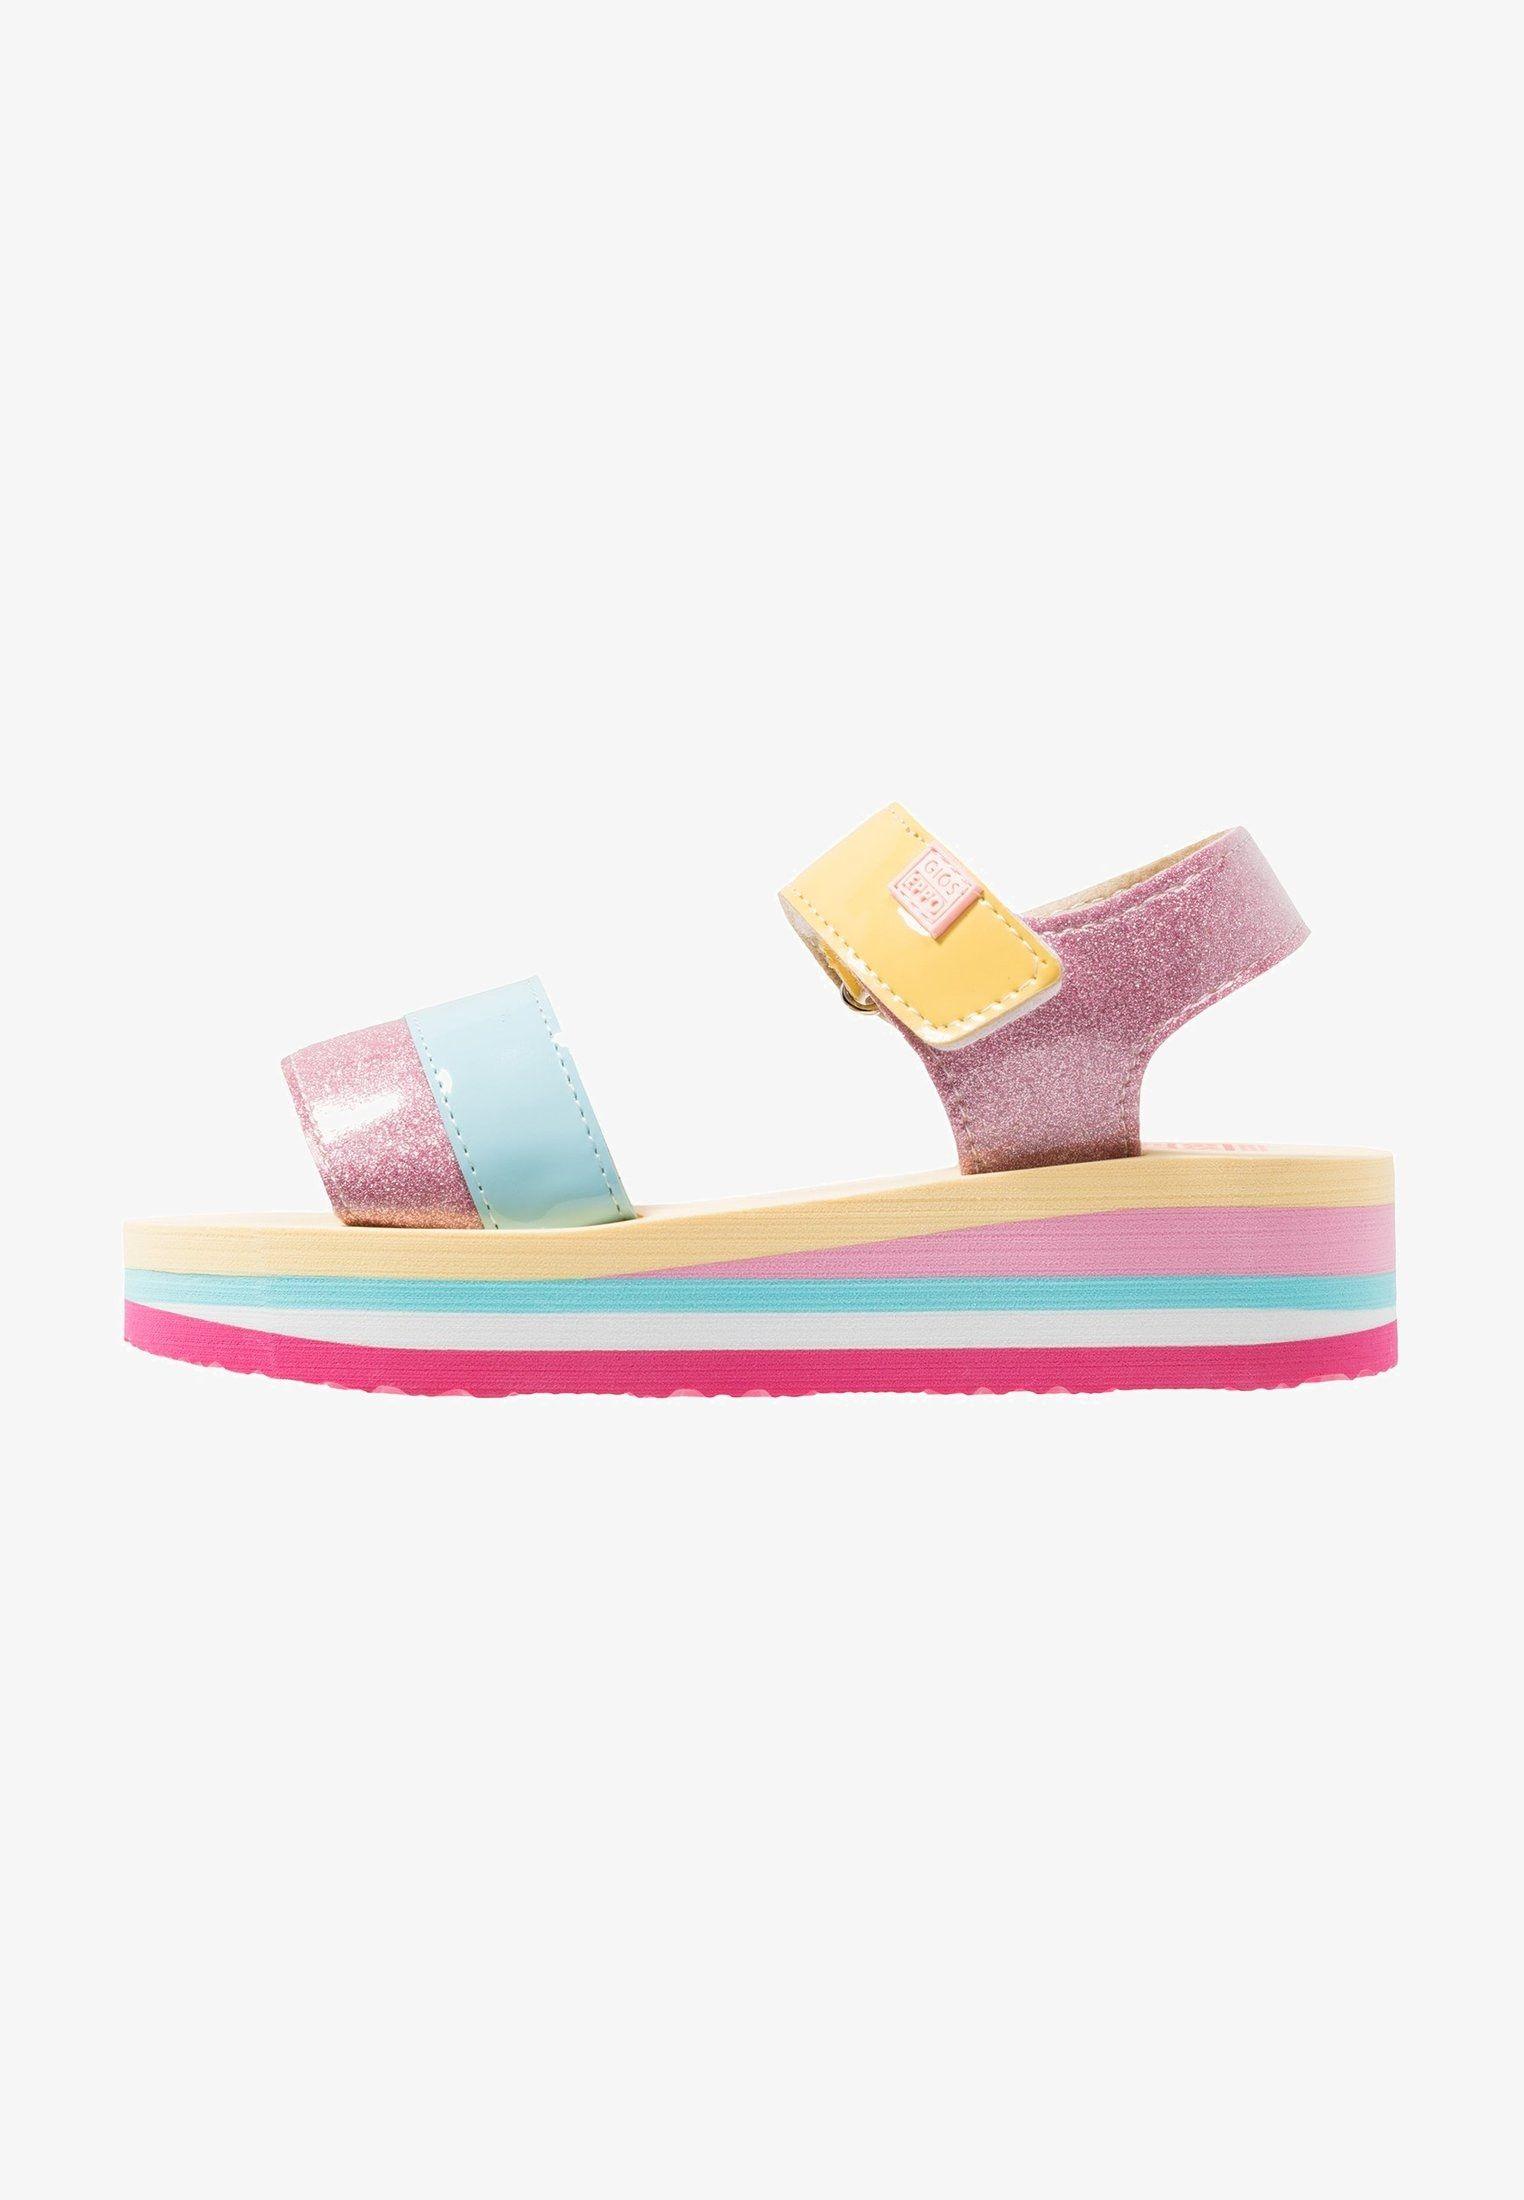 Campania Riemensandalette Rosa Zalando De Kinder Schuhe Schuhe Fur Madchen Sandalen